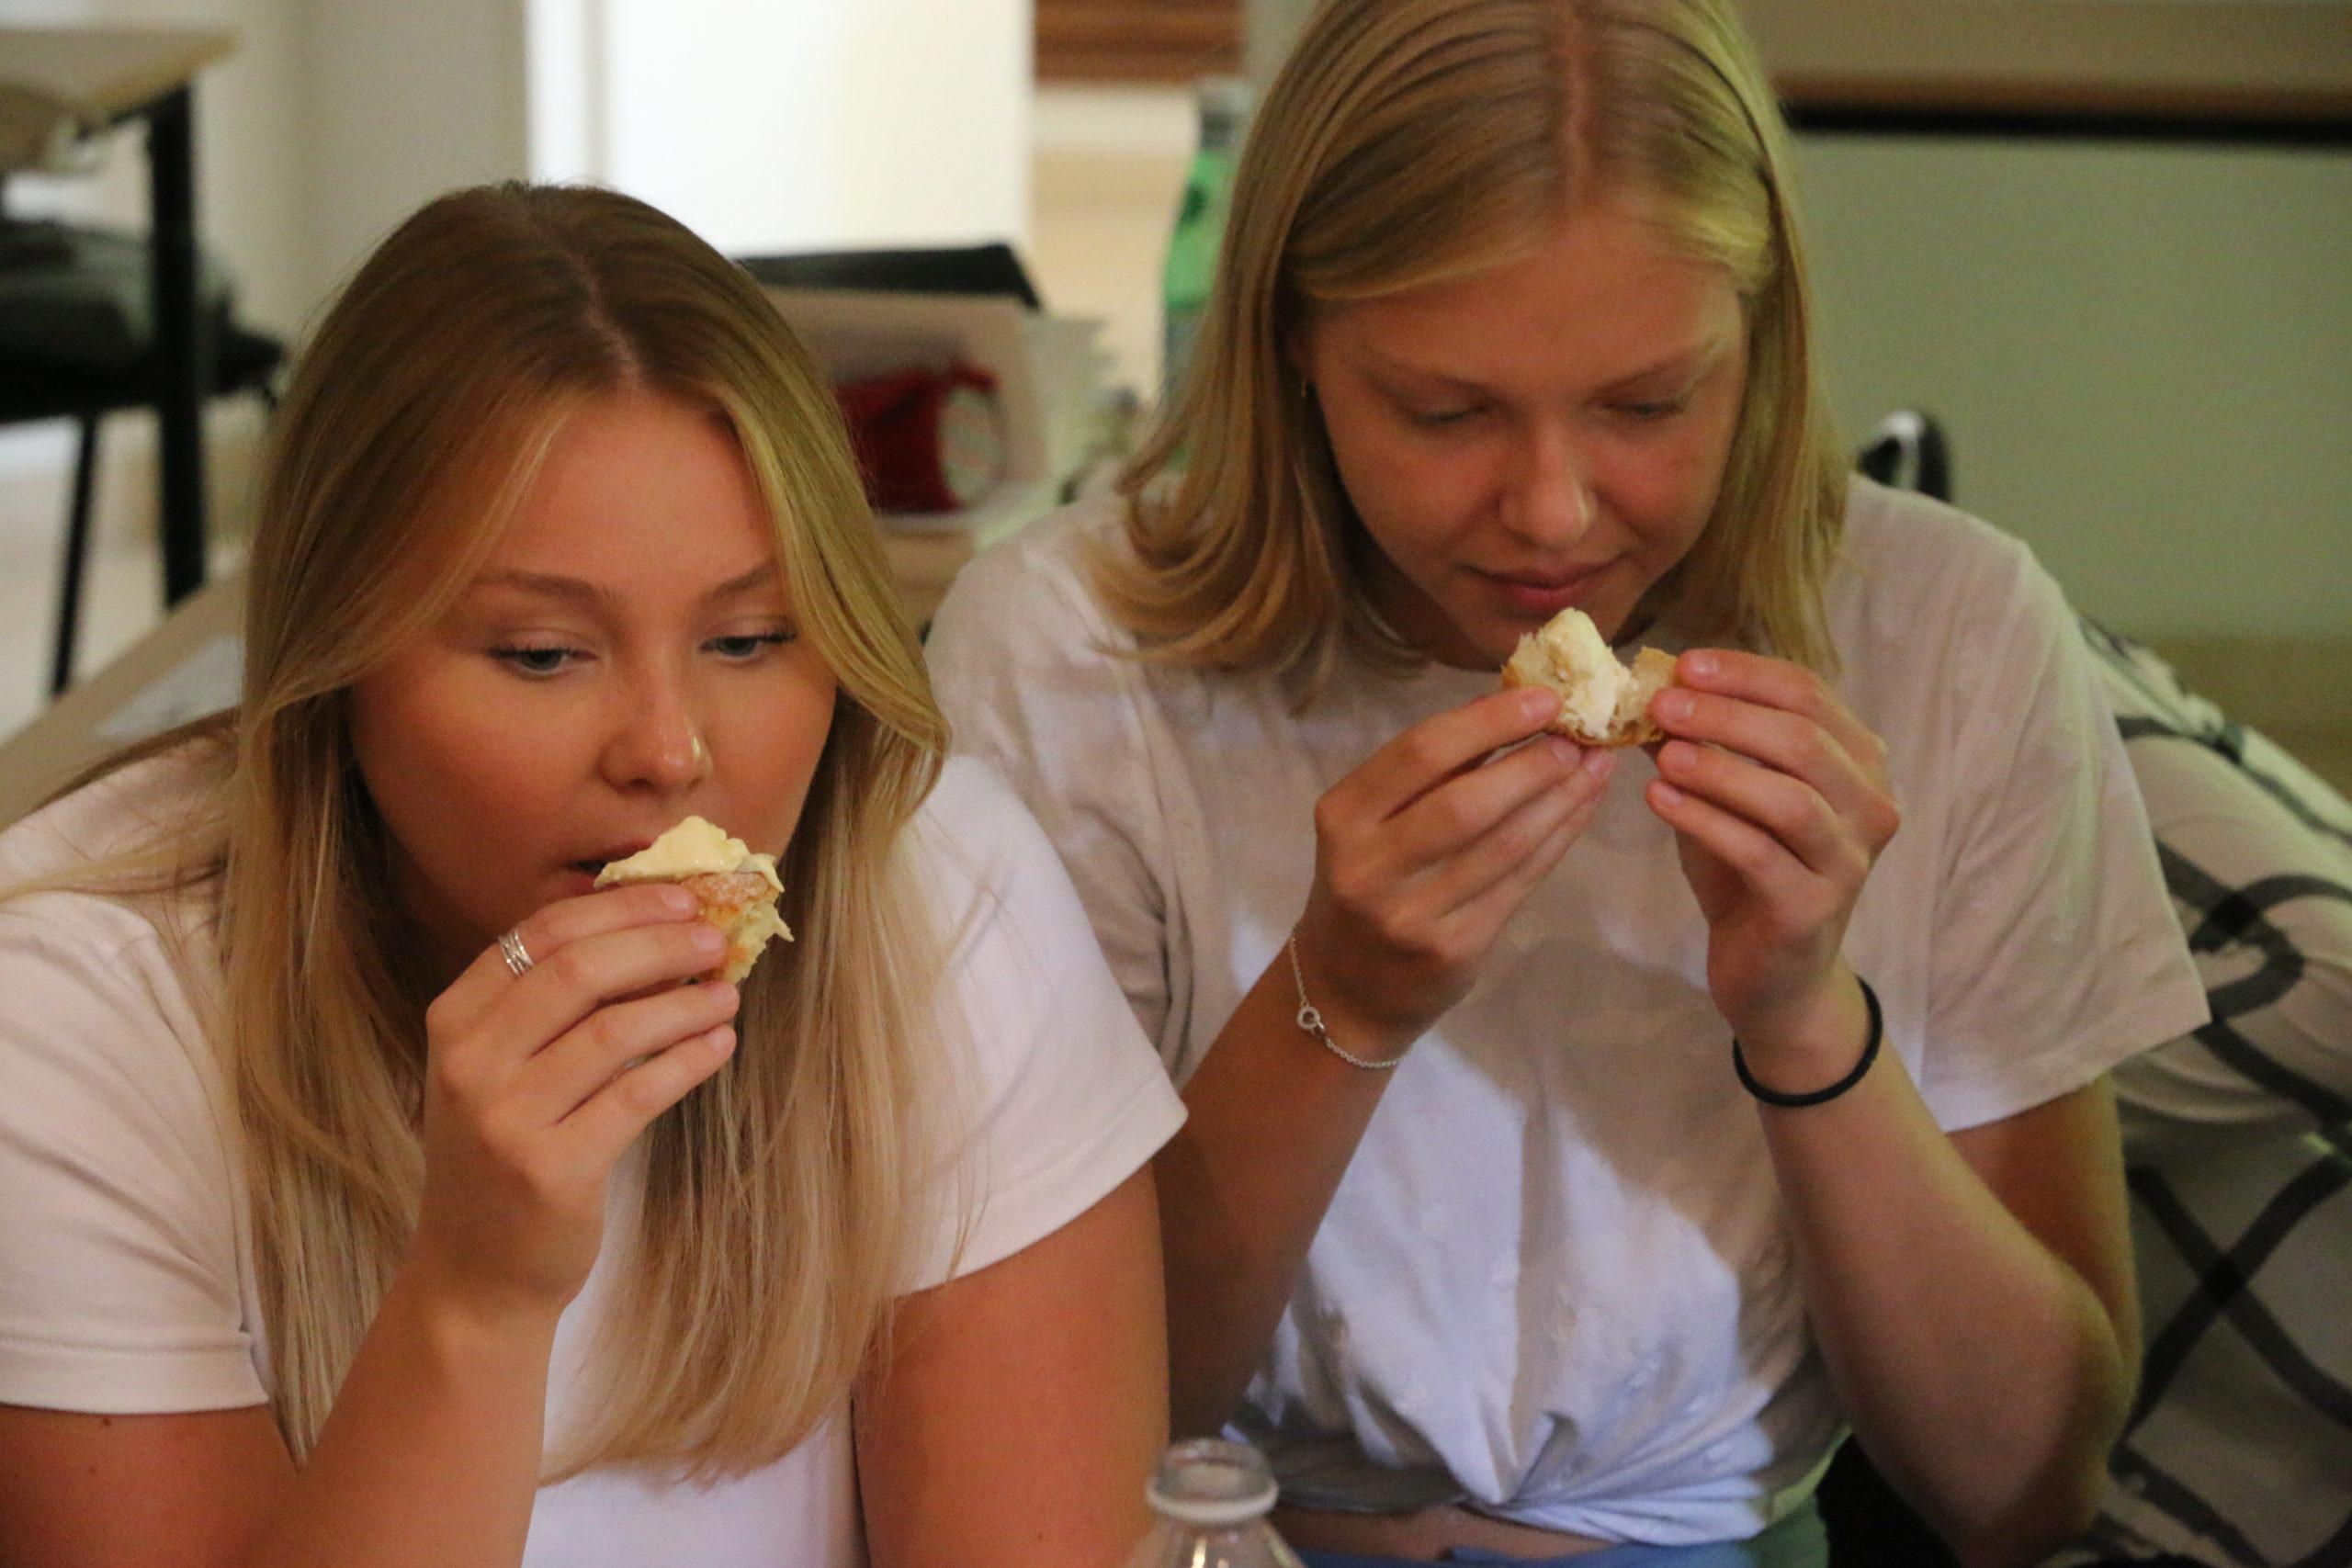 Cheese tasting in IS Aix-en-Provence